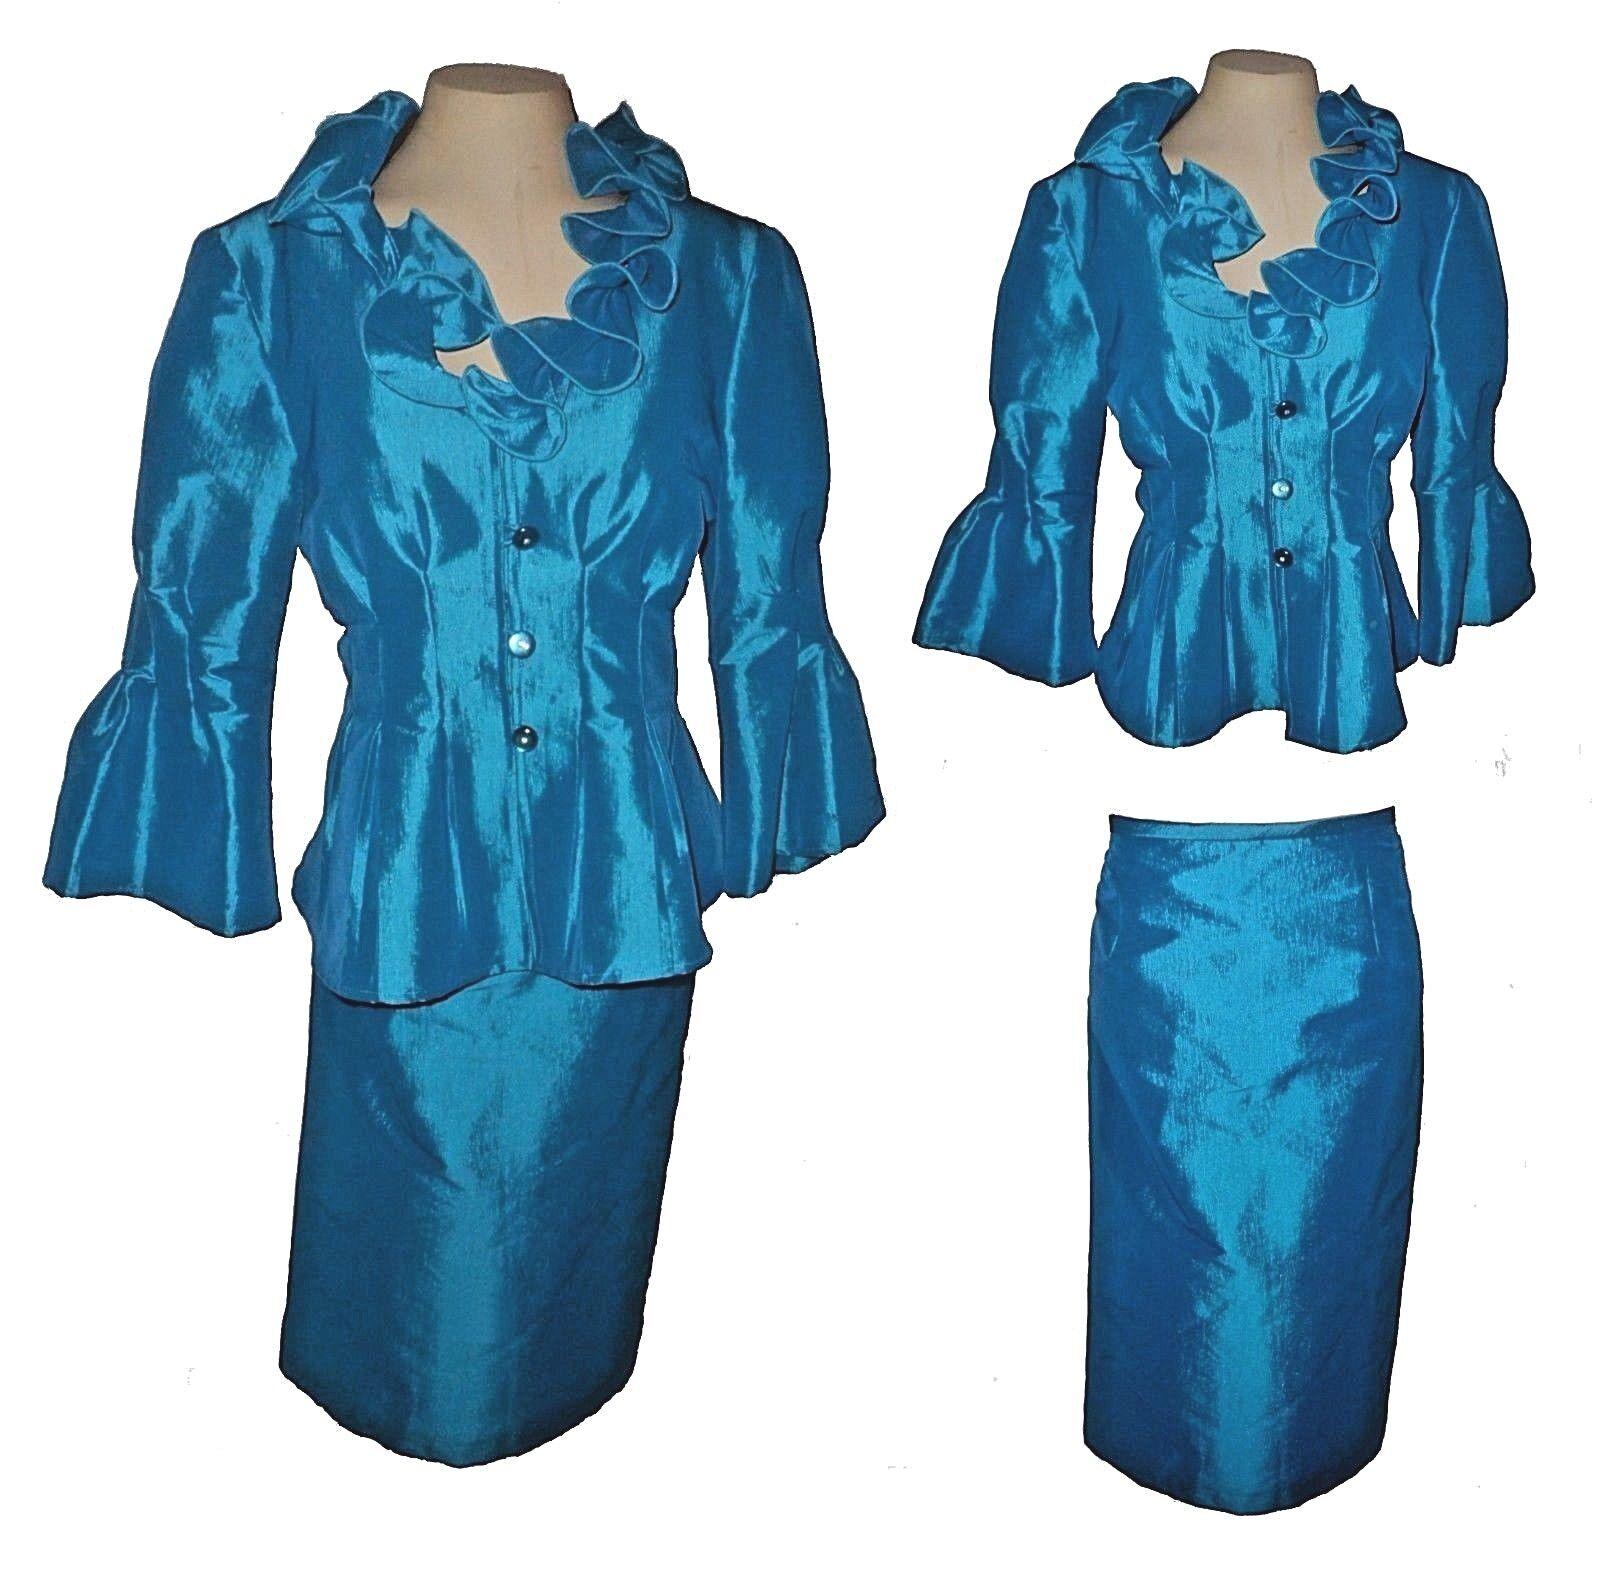 New 2-PC Suit  Skirt Blazer, Nicolette, Ruffled-Collar Pleated-Waist Taffeta 10